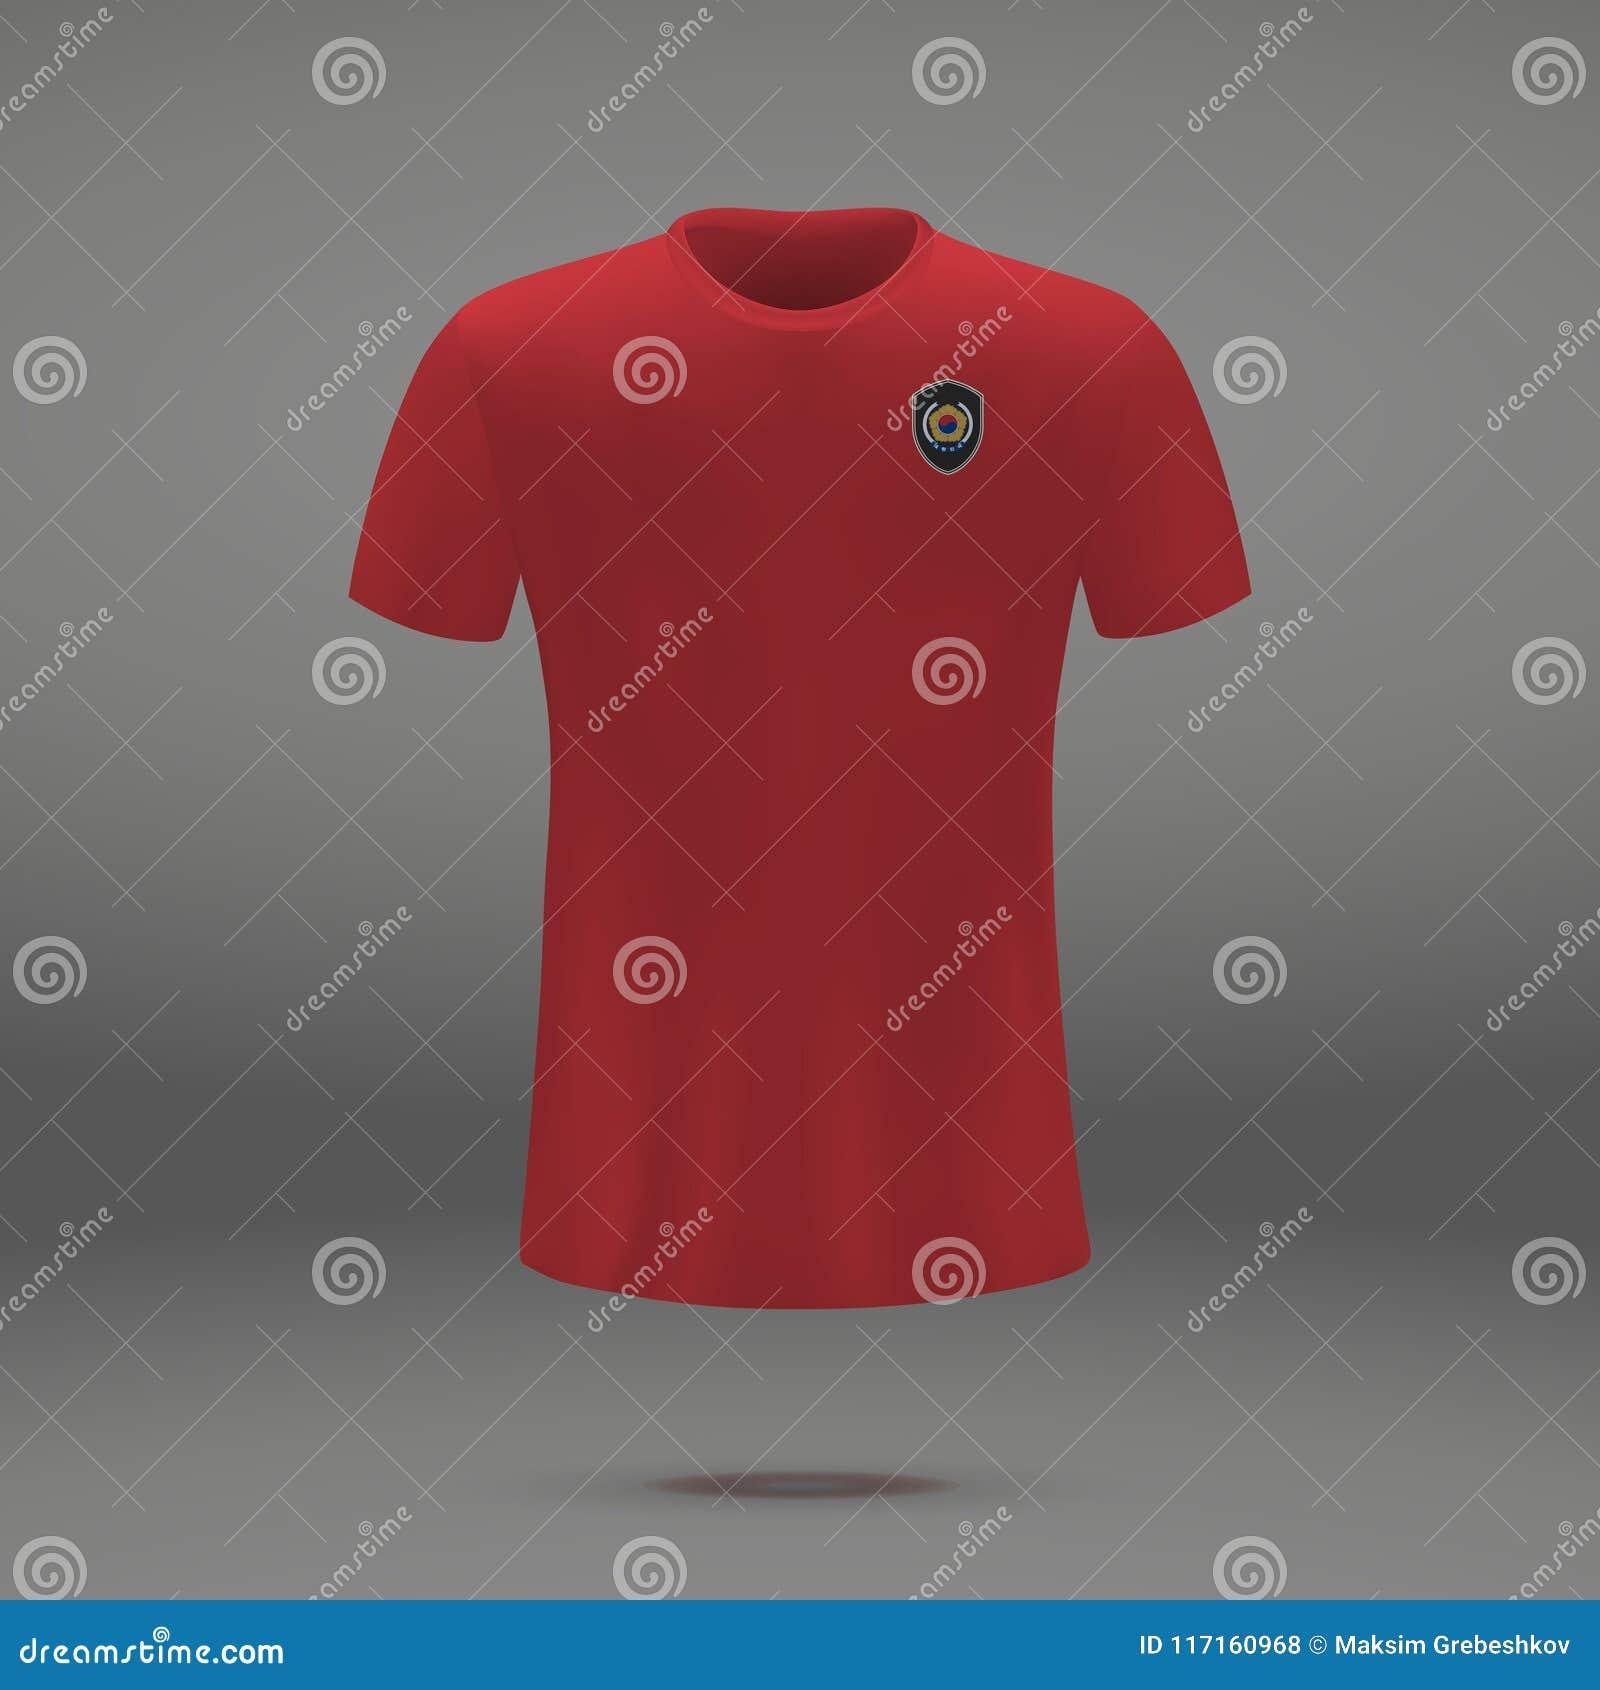 4524a56c8 Football kit of South Korea 2018, t-shirt template for soccer jersey. Vector  illustration. More similar stock illustrations